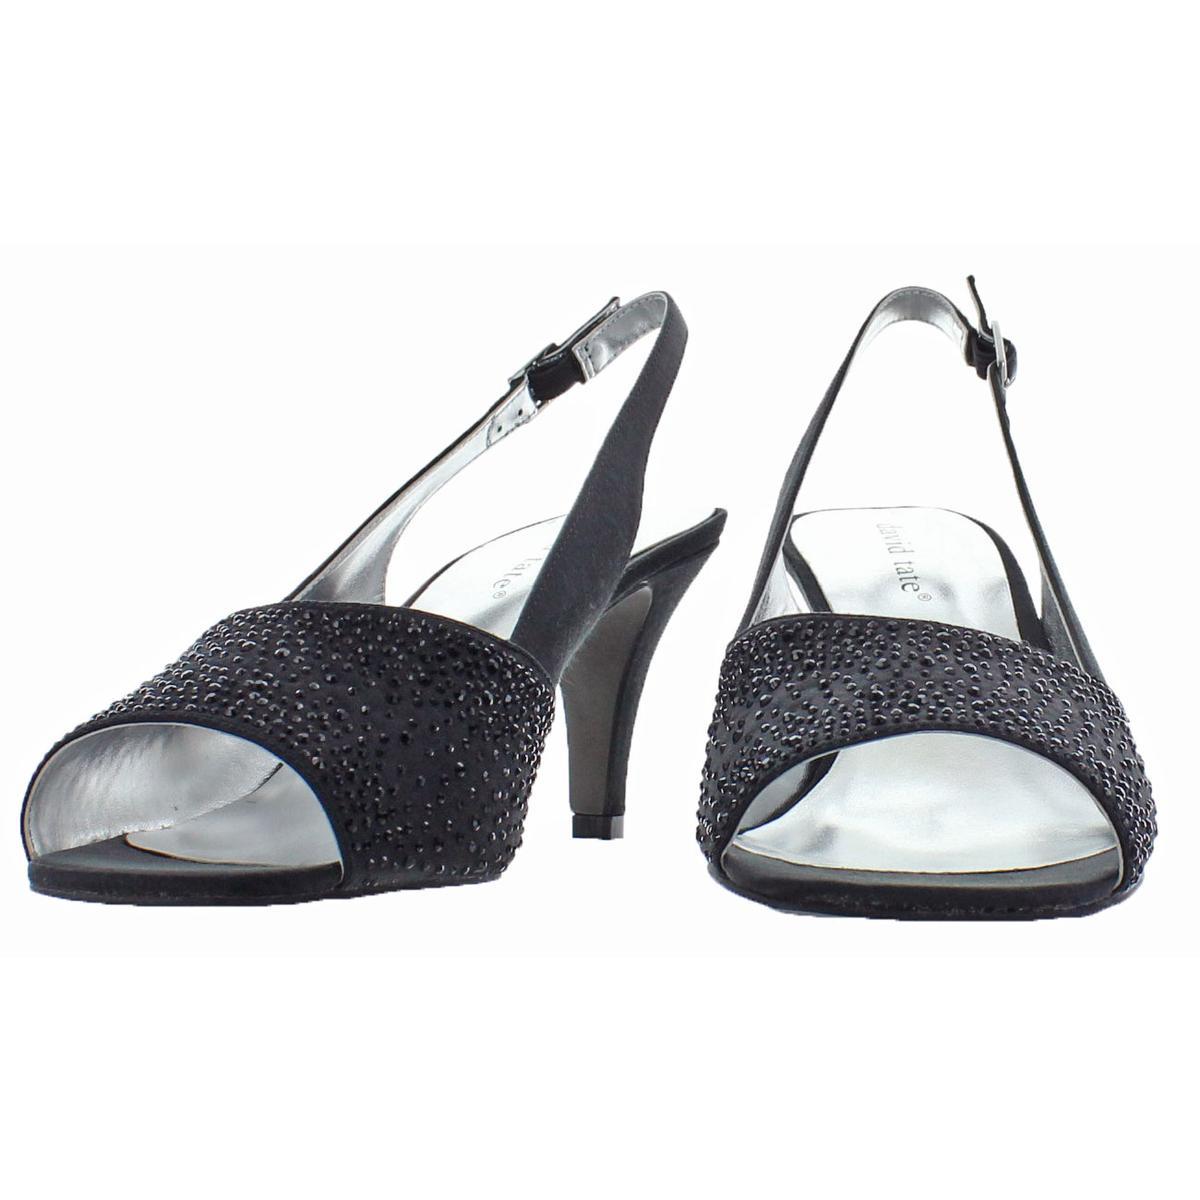 David-Tate-Women-039-s-Stunning-Satin-Embellished-Slingback-Dress-Pump thumbnail 4